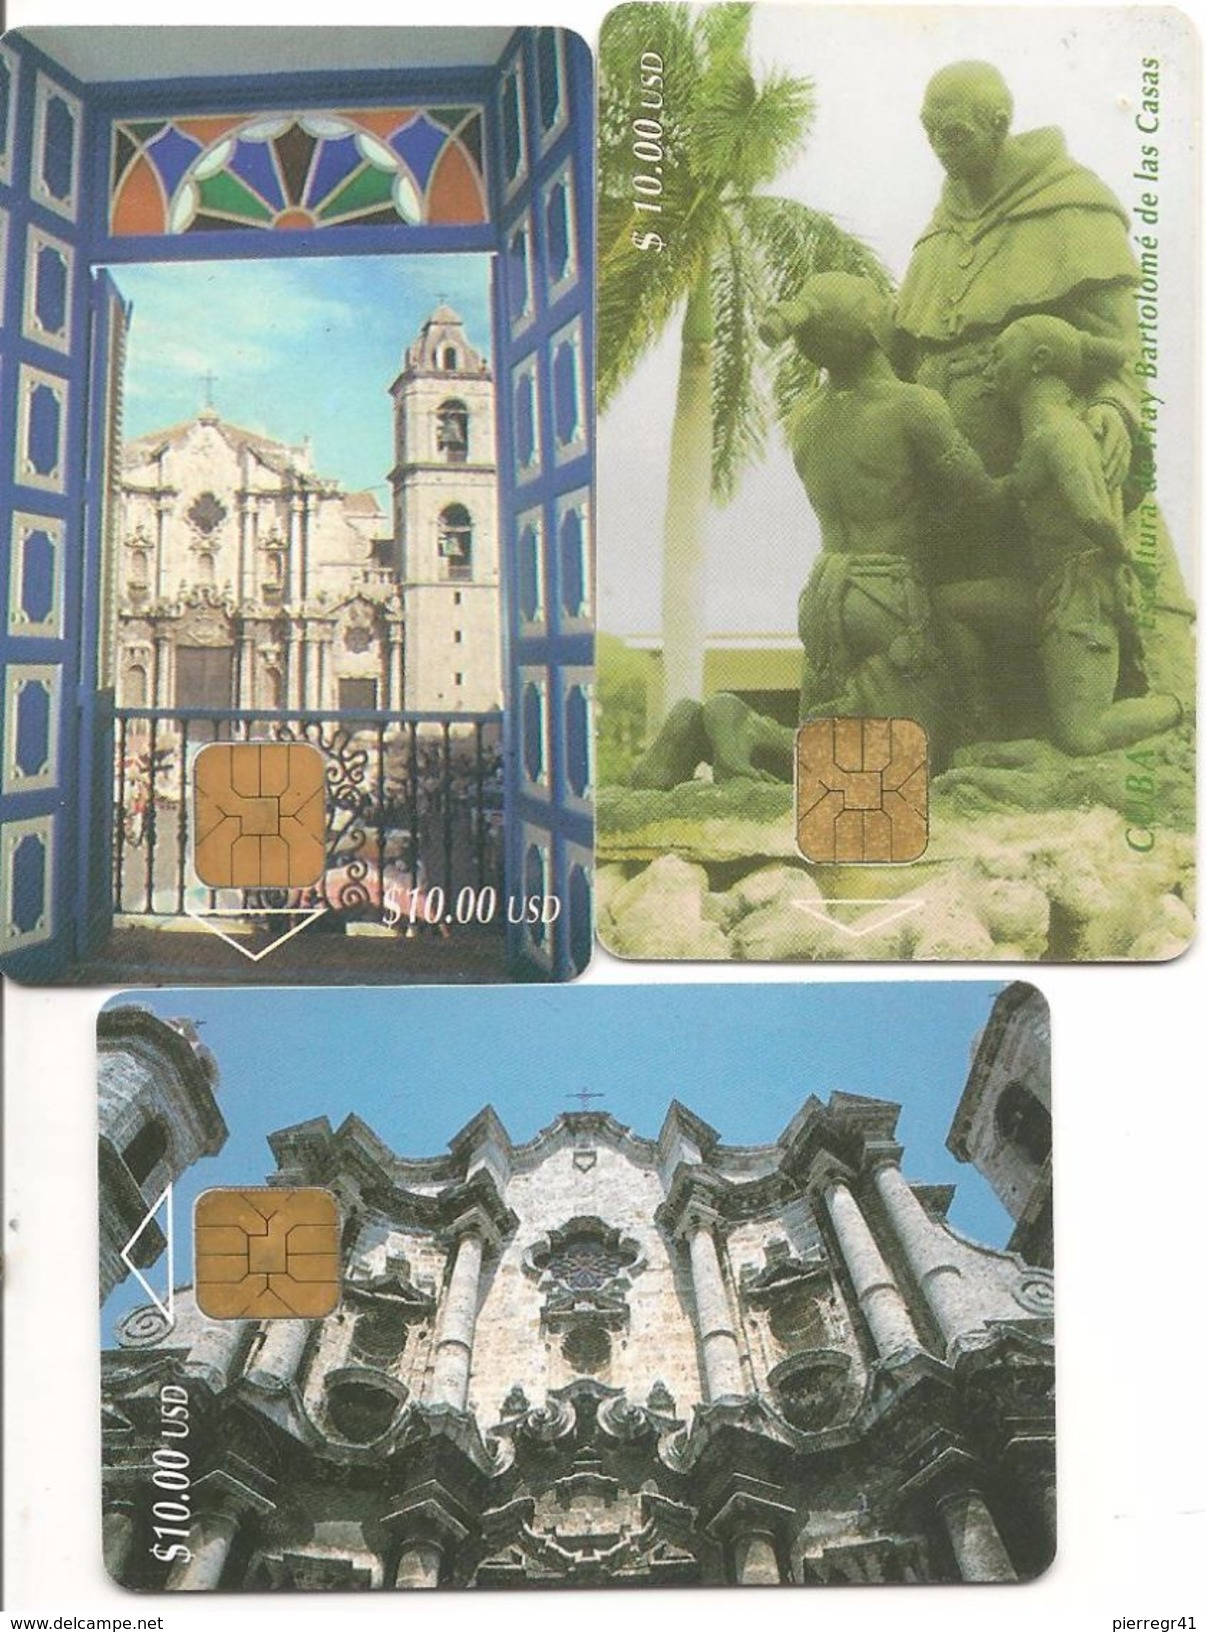 3-CARTES PUCE-CUBA-THEMES MONUMENTS-TBE - Cuba